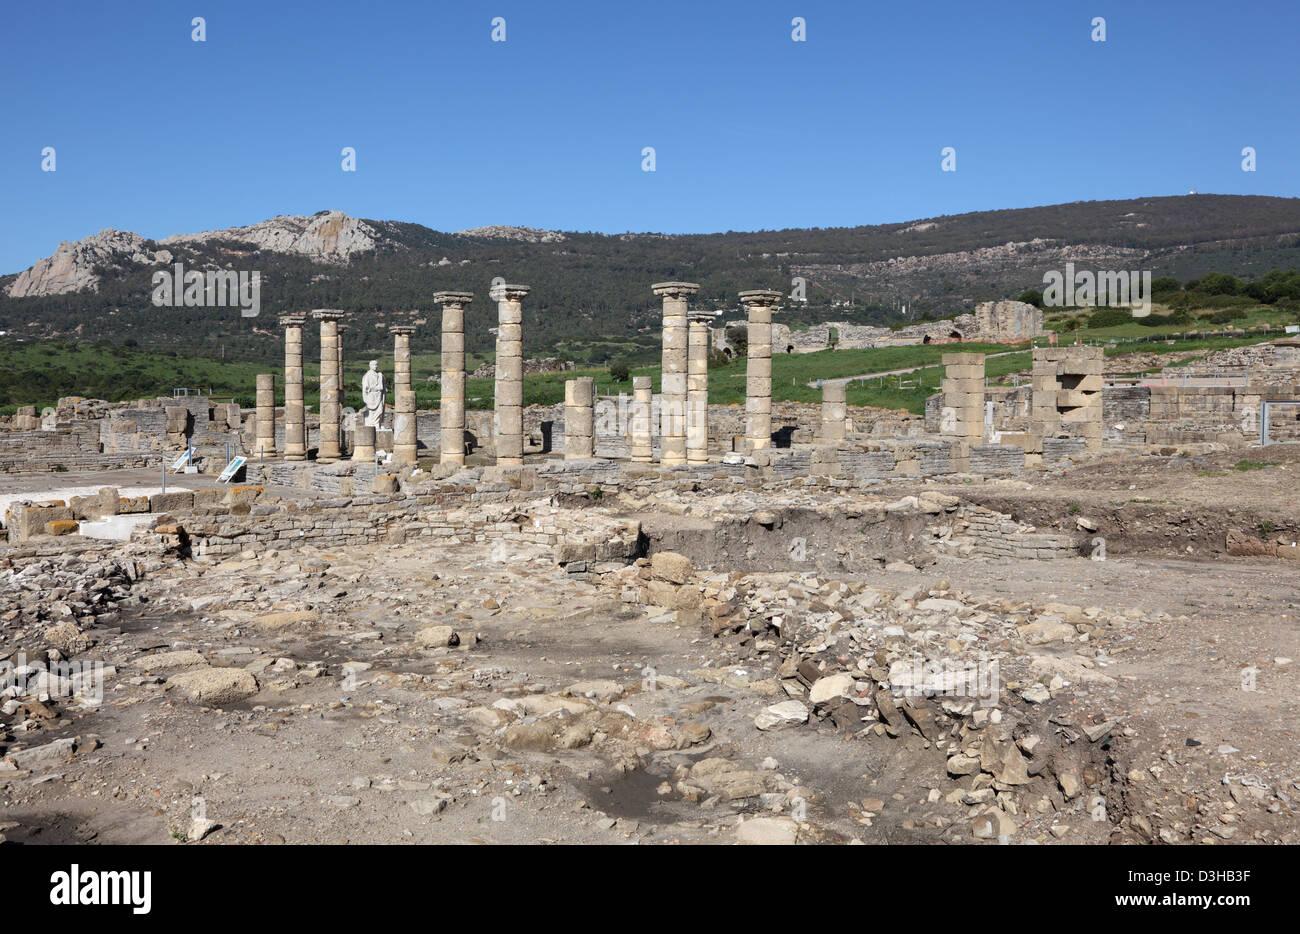 Roman ruin Baleo Claudia in Bolonia, Andalusia, southern Spain Stock Photo